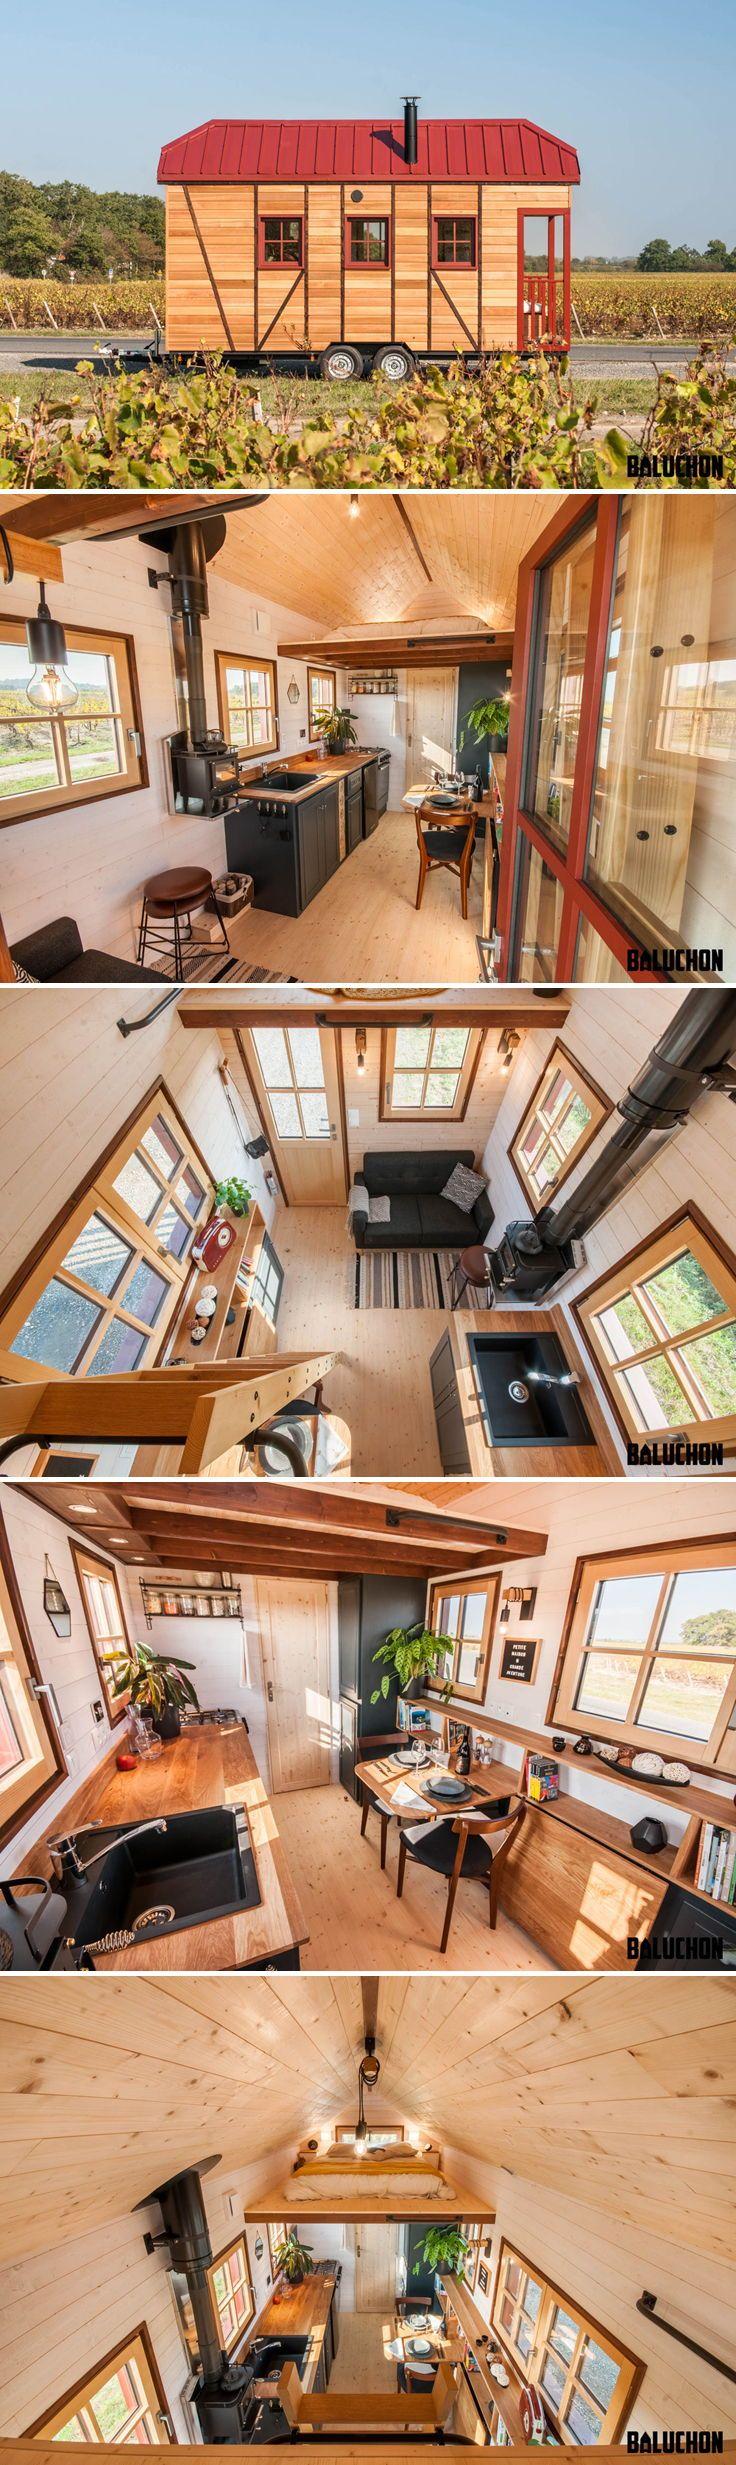 Holz Hisla by Baluchon - Tiny Living #tinyhousebathroom